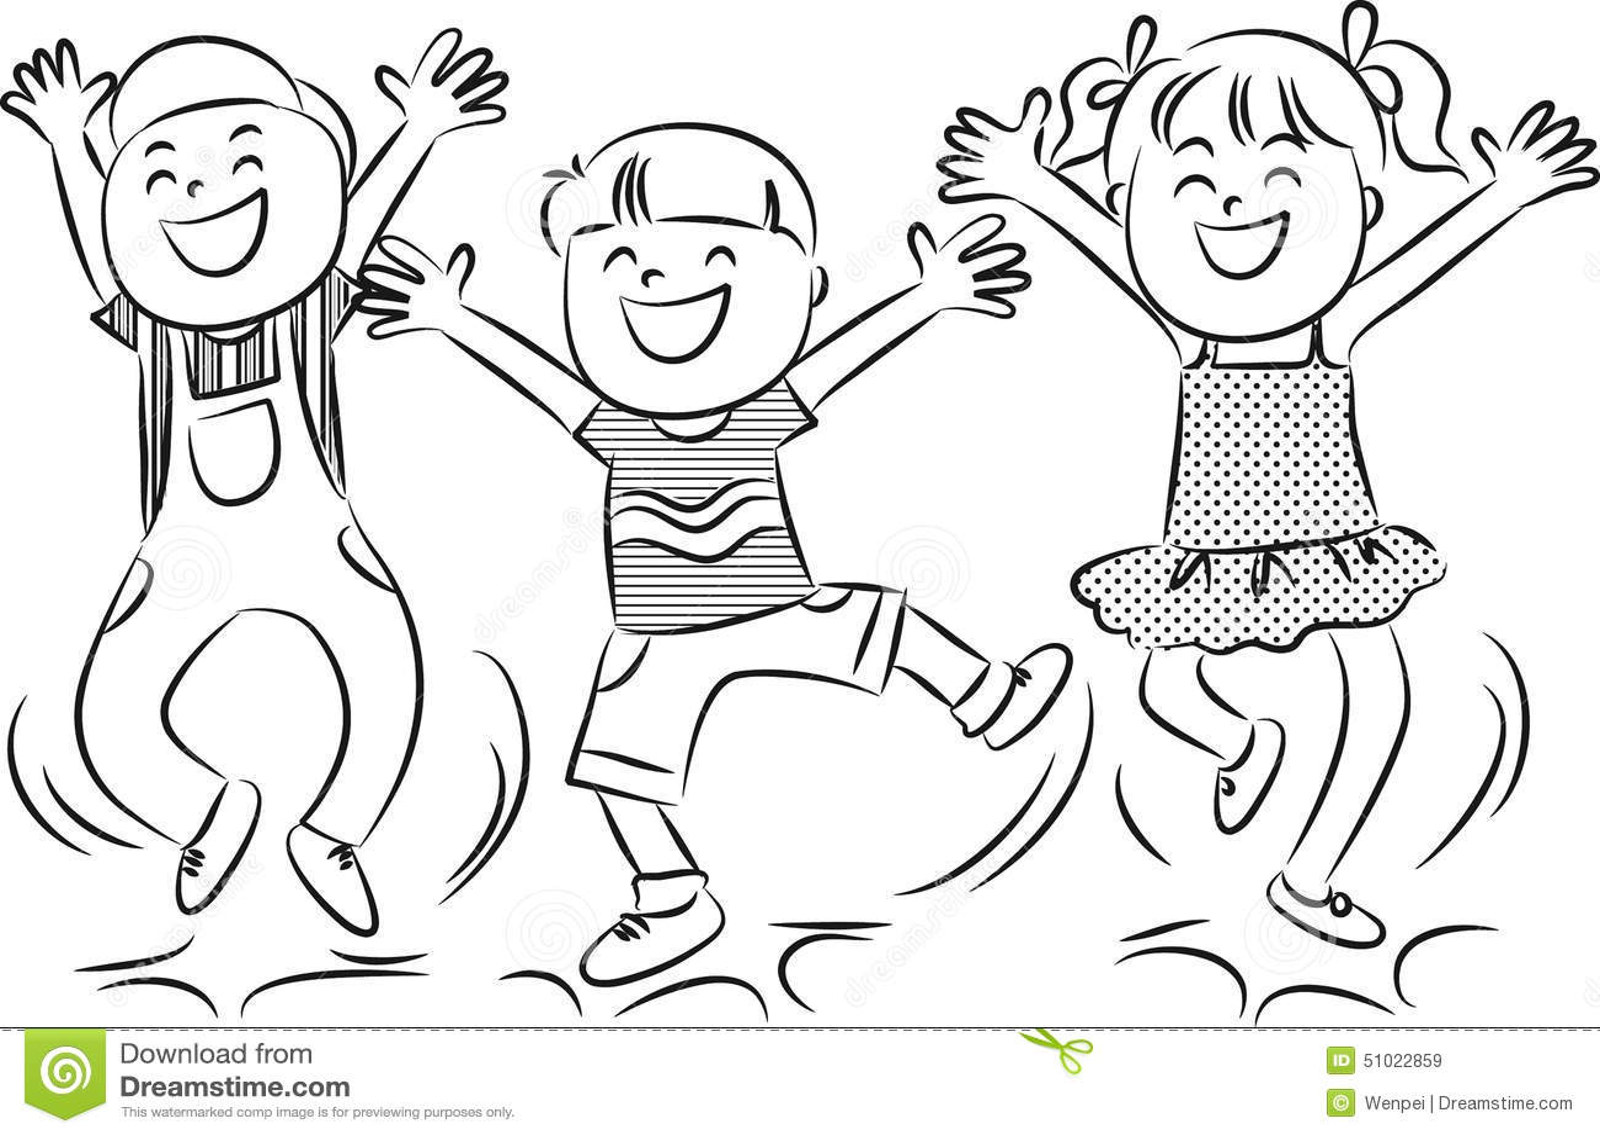 Cartoon Happy Jumping Kids Stock Illustration